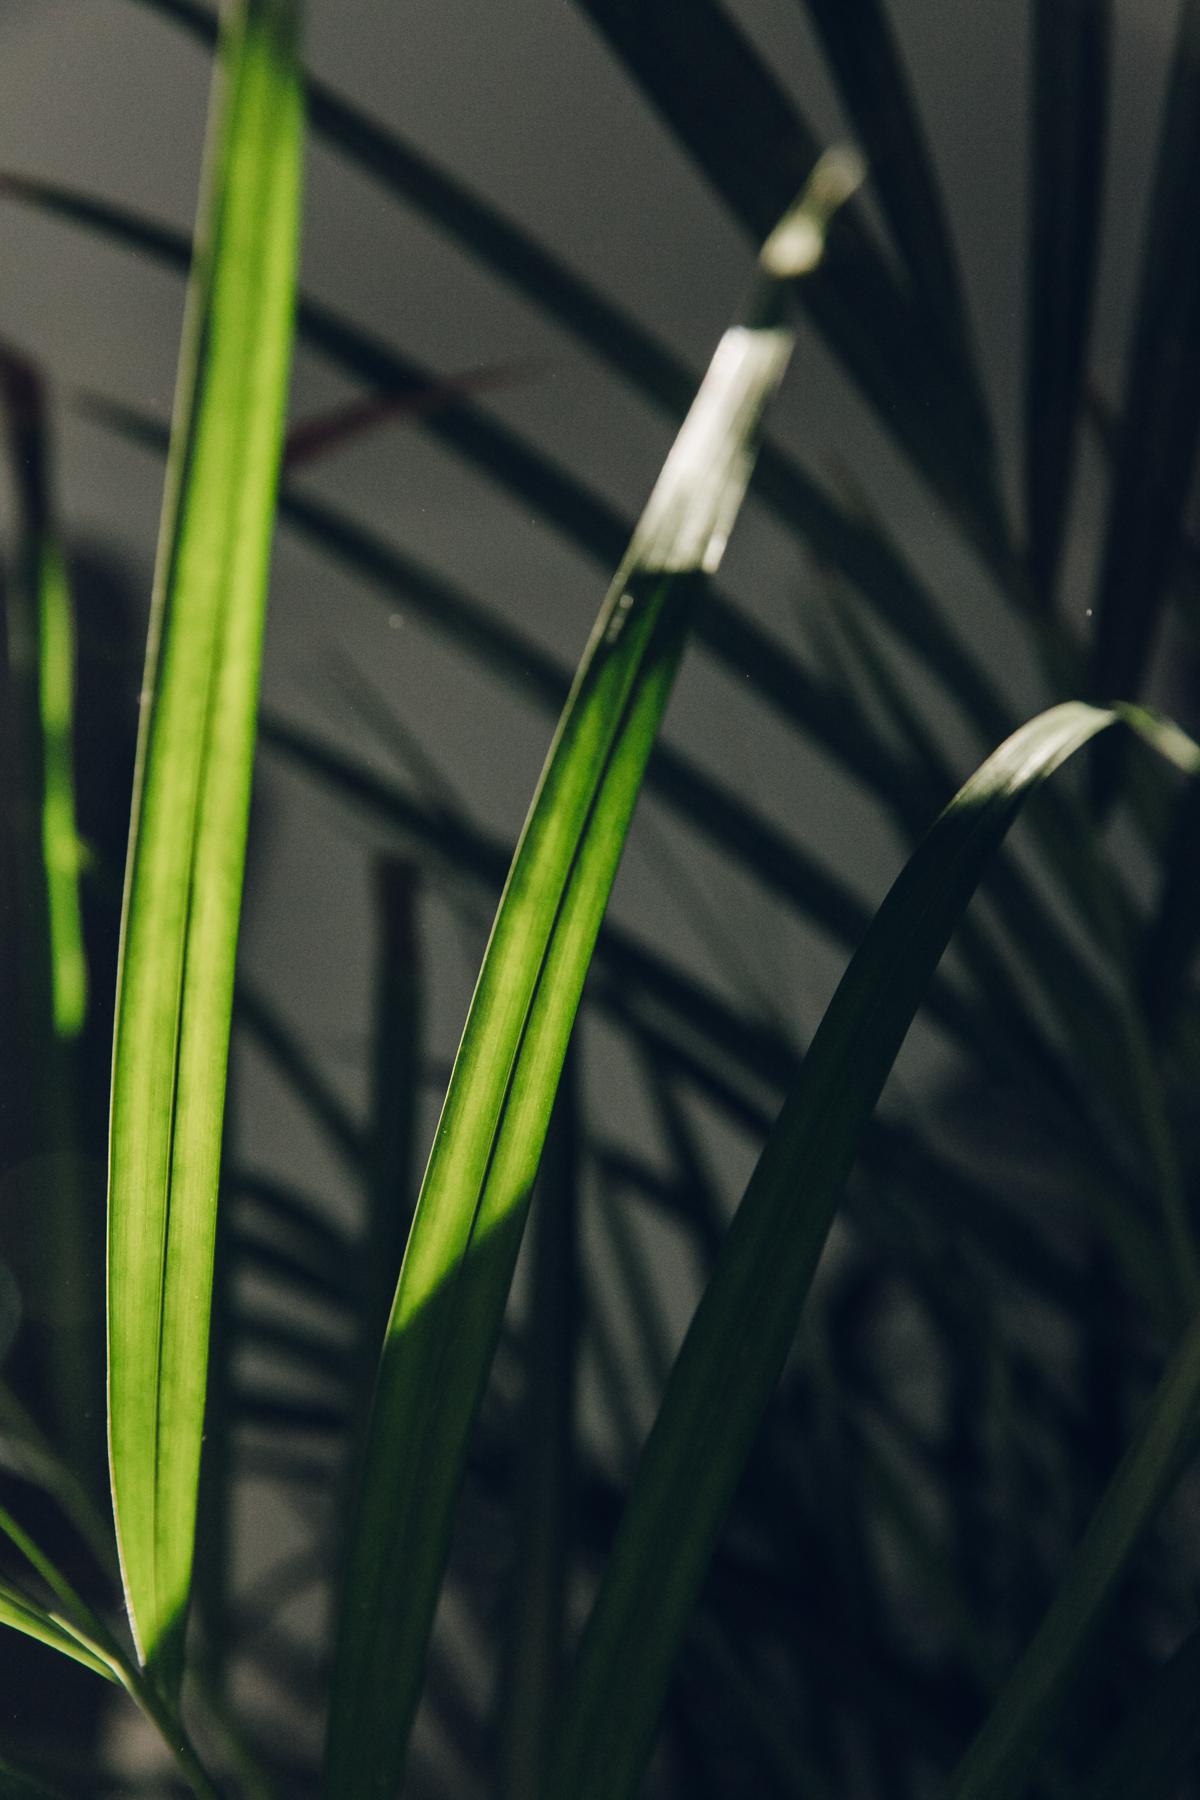 Sunlight through palm leaves.